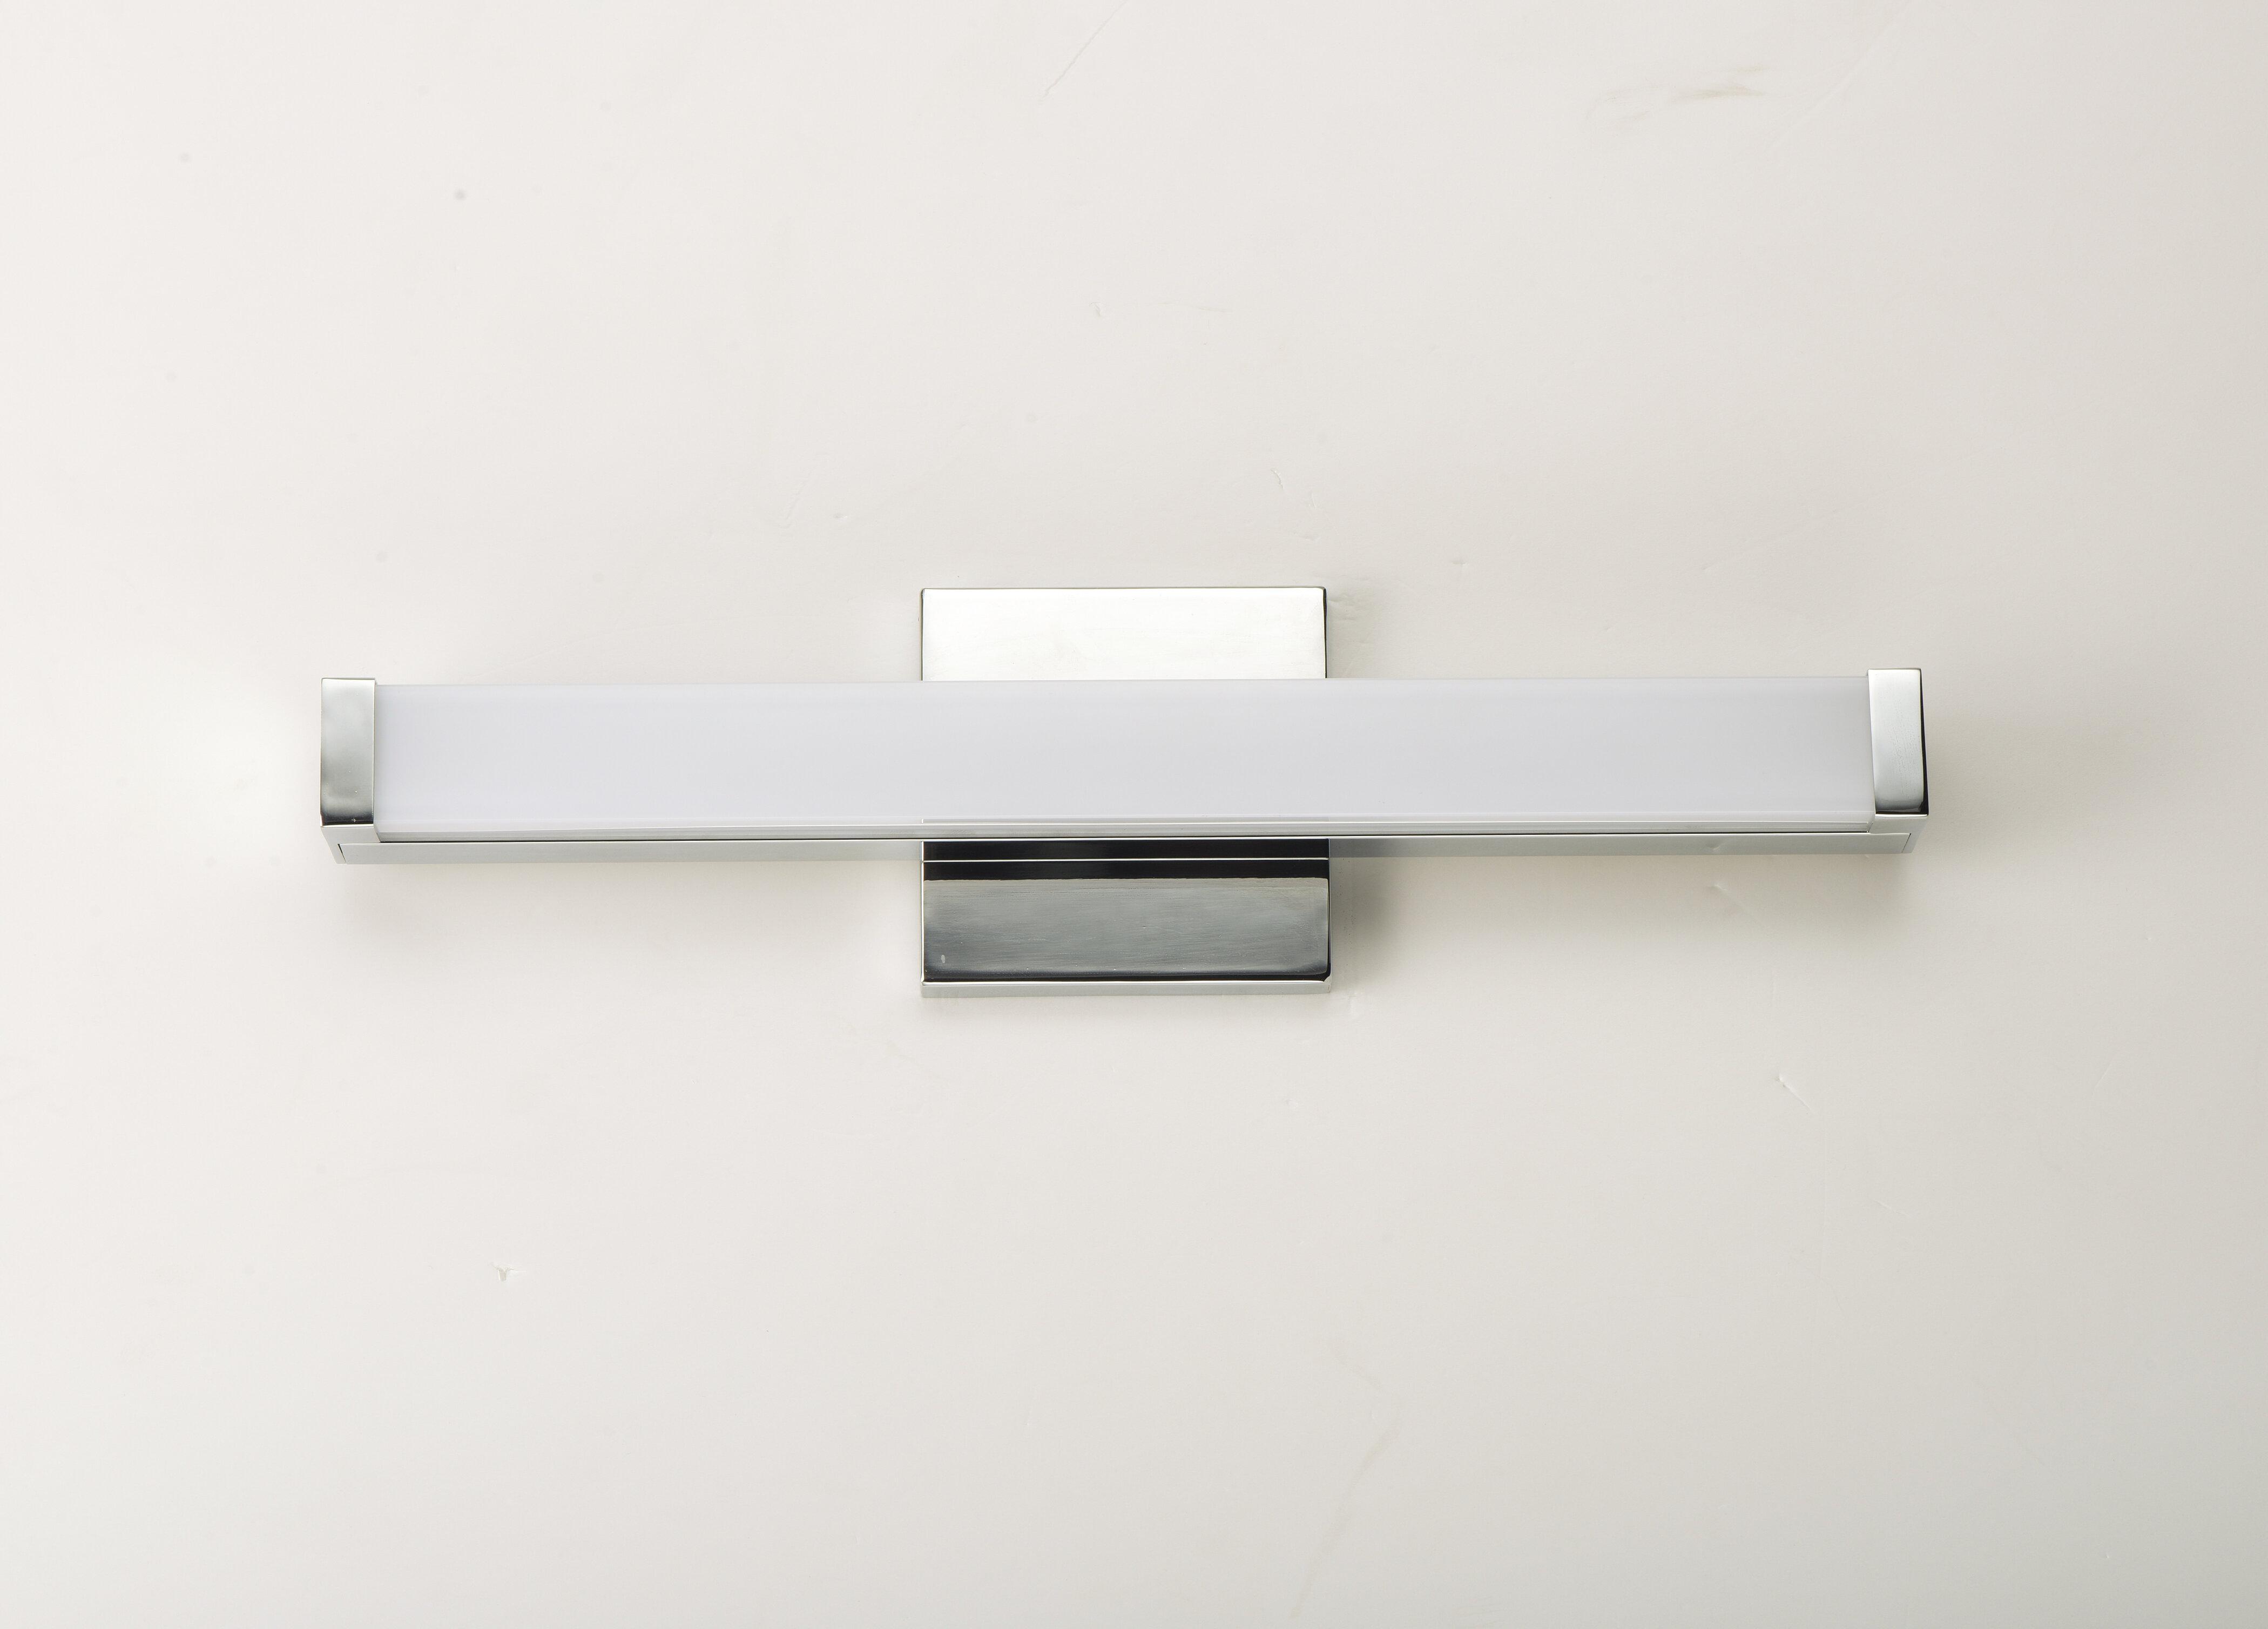 Ebern Designs Lavenia 1 Light Dimmable Led Bath Bar Reviews Wayfair Ca